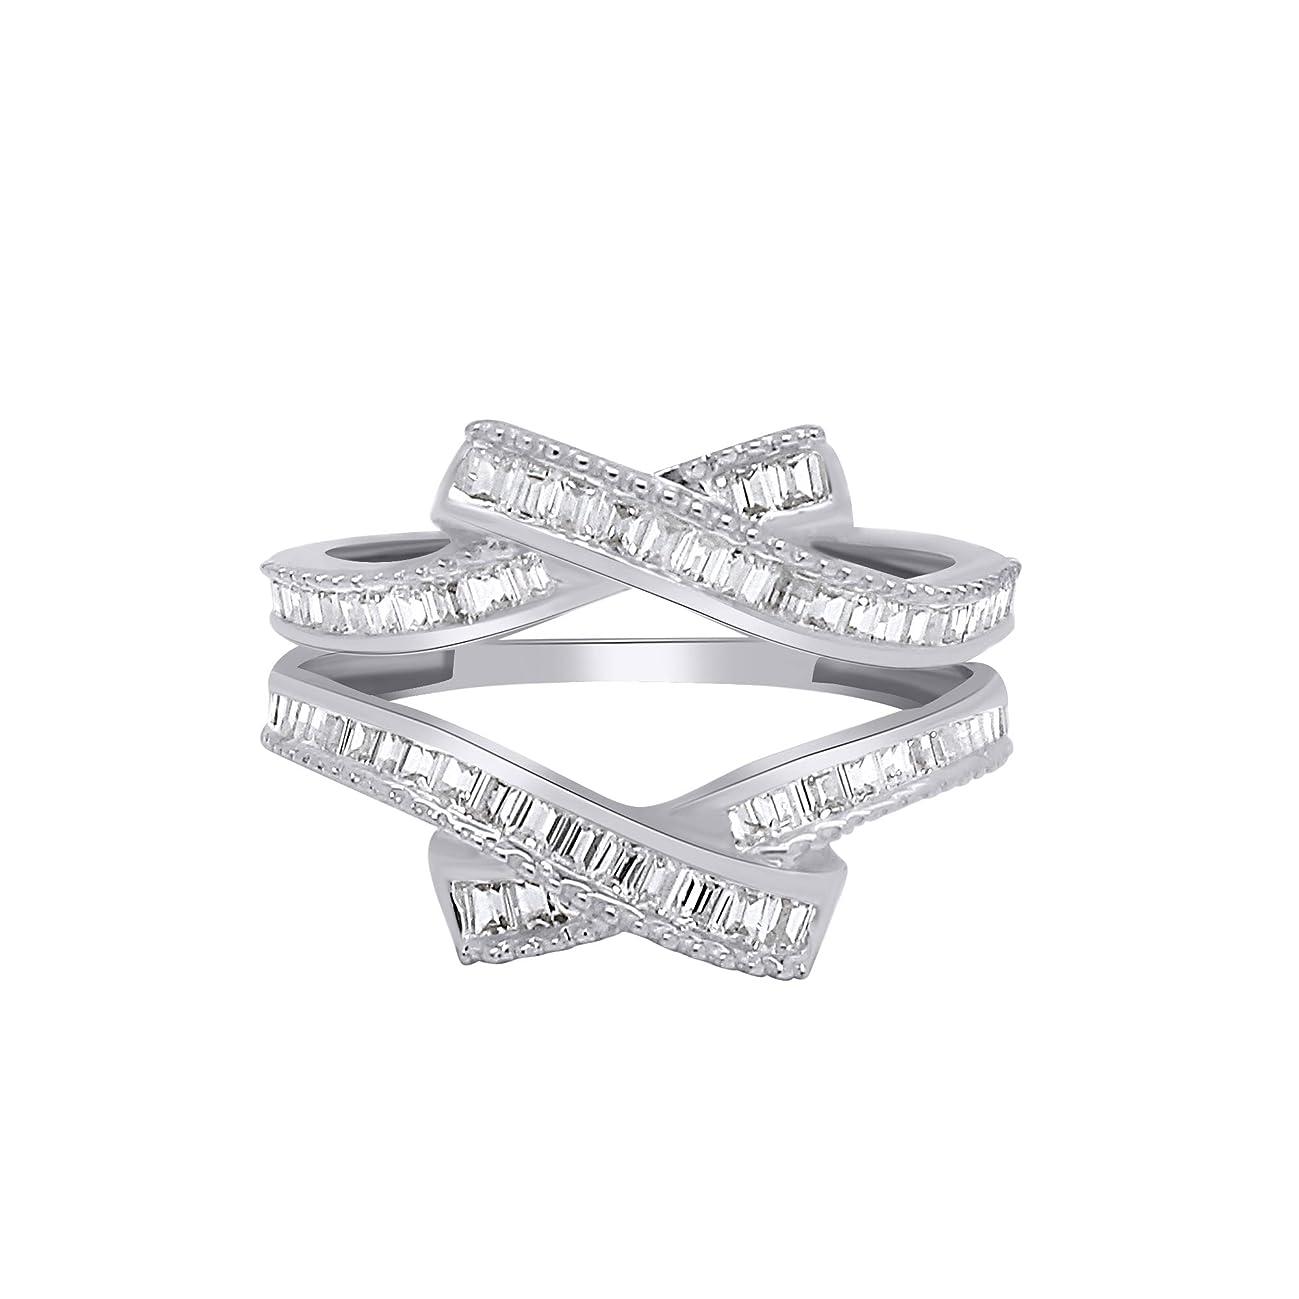 OMEGA JEWELLERY 0.58 Ct Baguette Shape Natural Diamond 14K White Gold Enhancer Wrap Guard Ring Sz-8